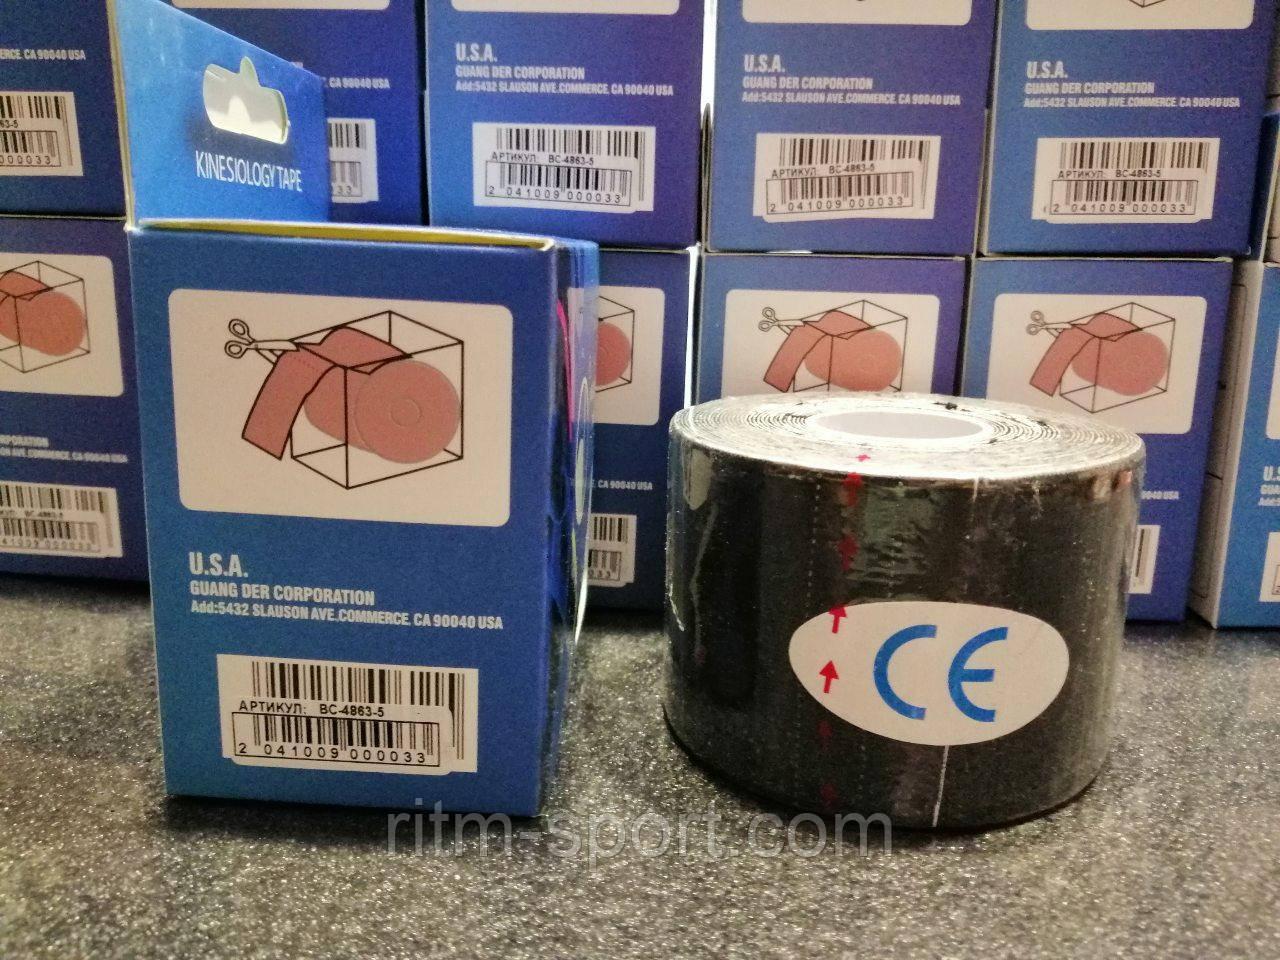 Кинезио тейп (Kinesio) эластичный пластырь  (l-5м * 5см, черный)